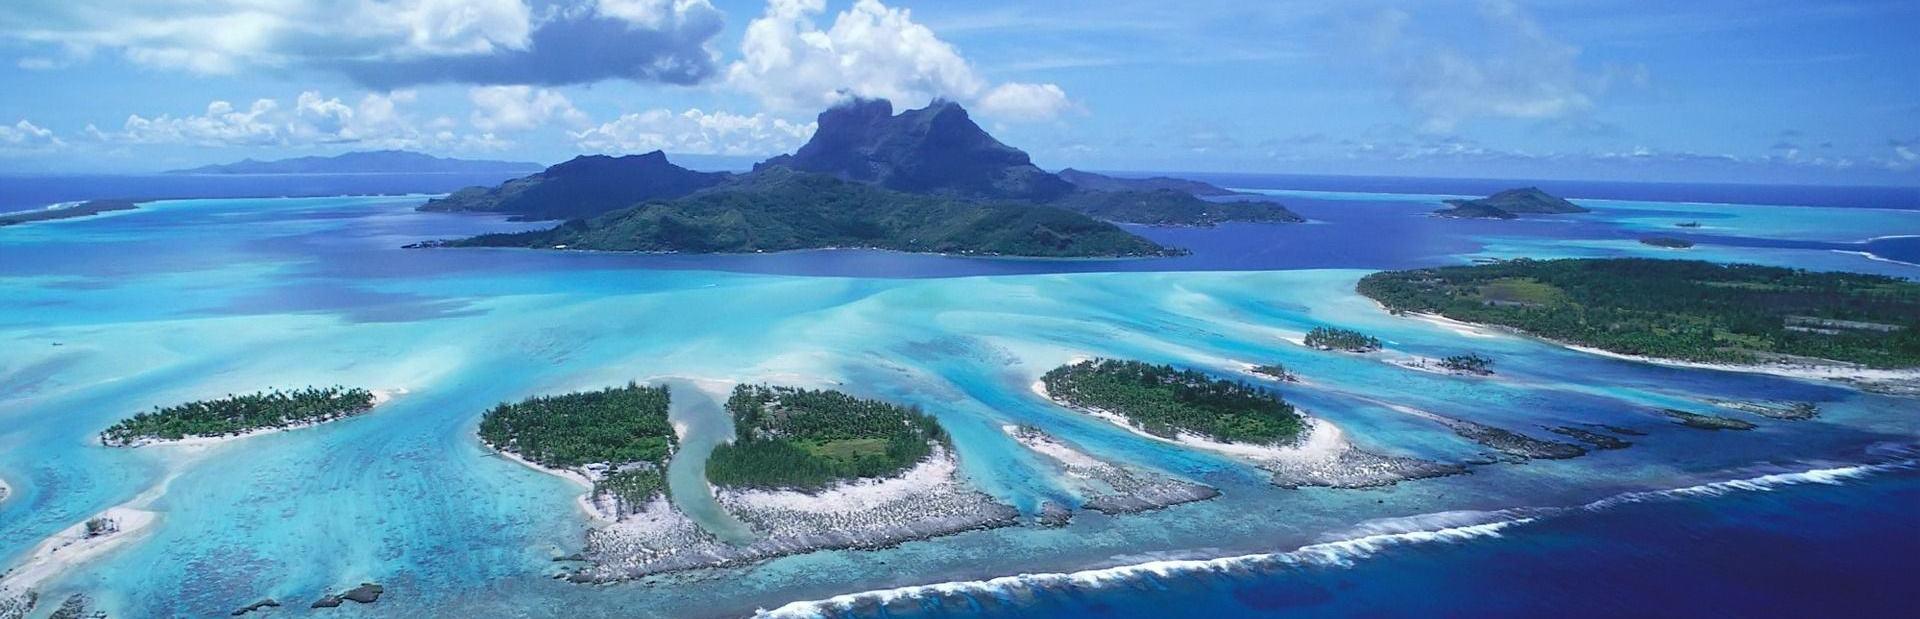 Fiji climate photo